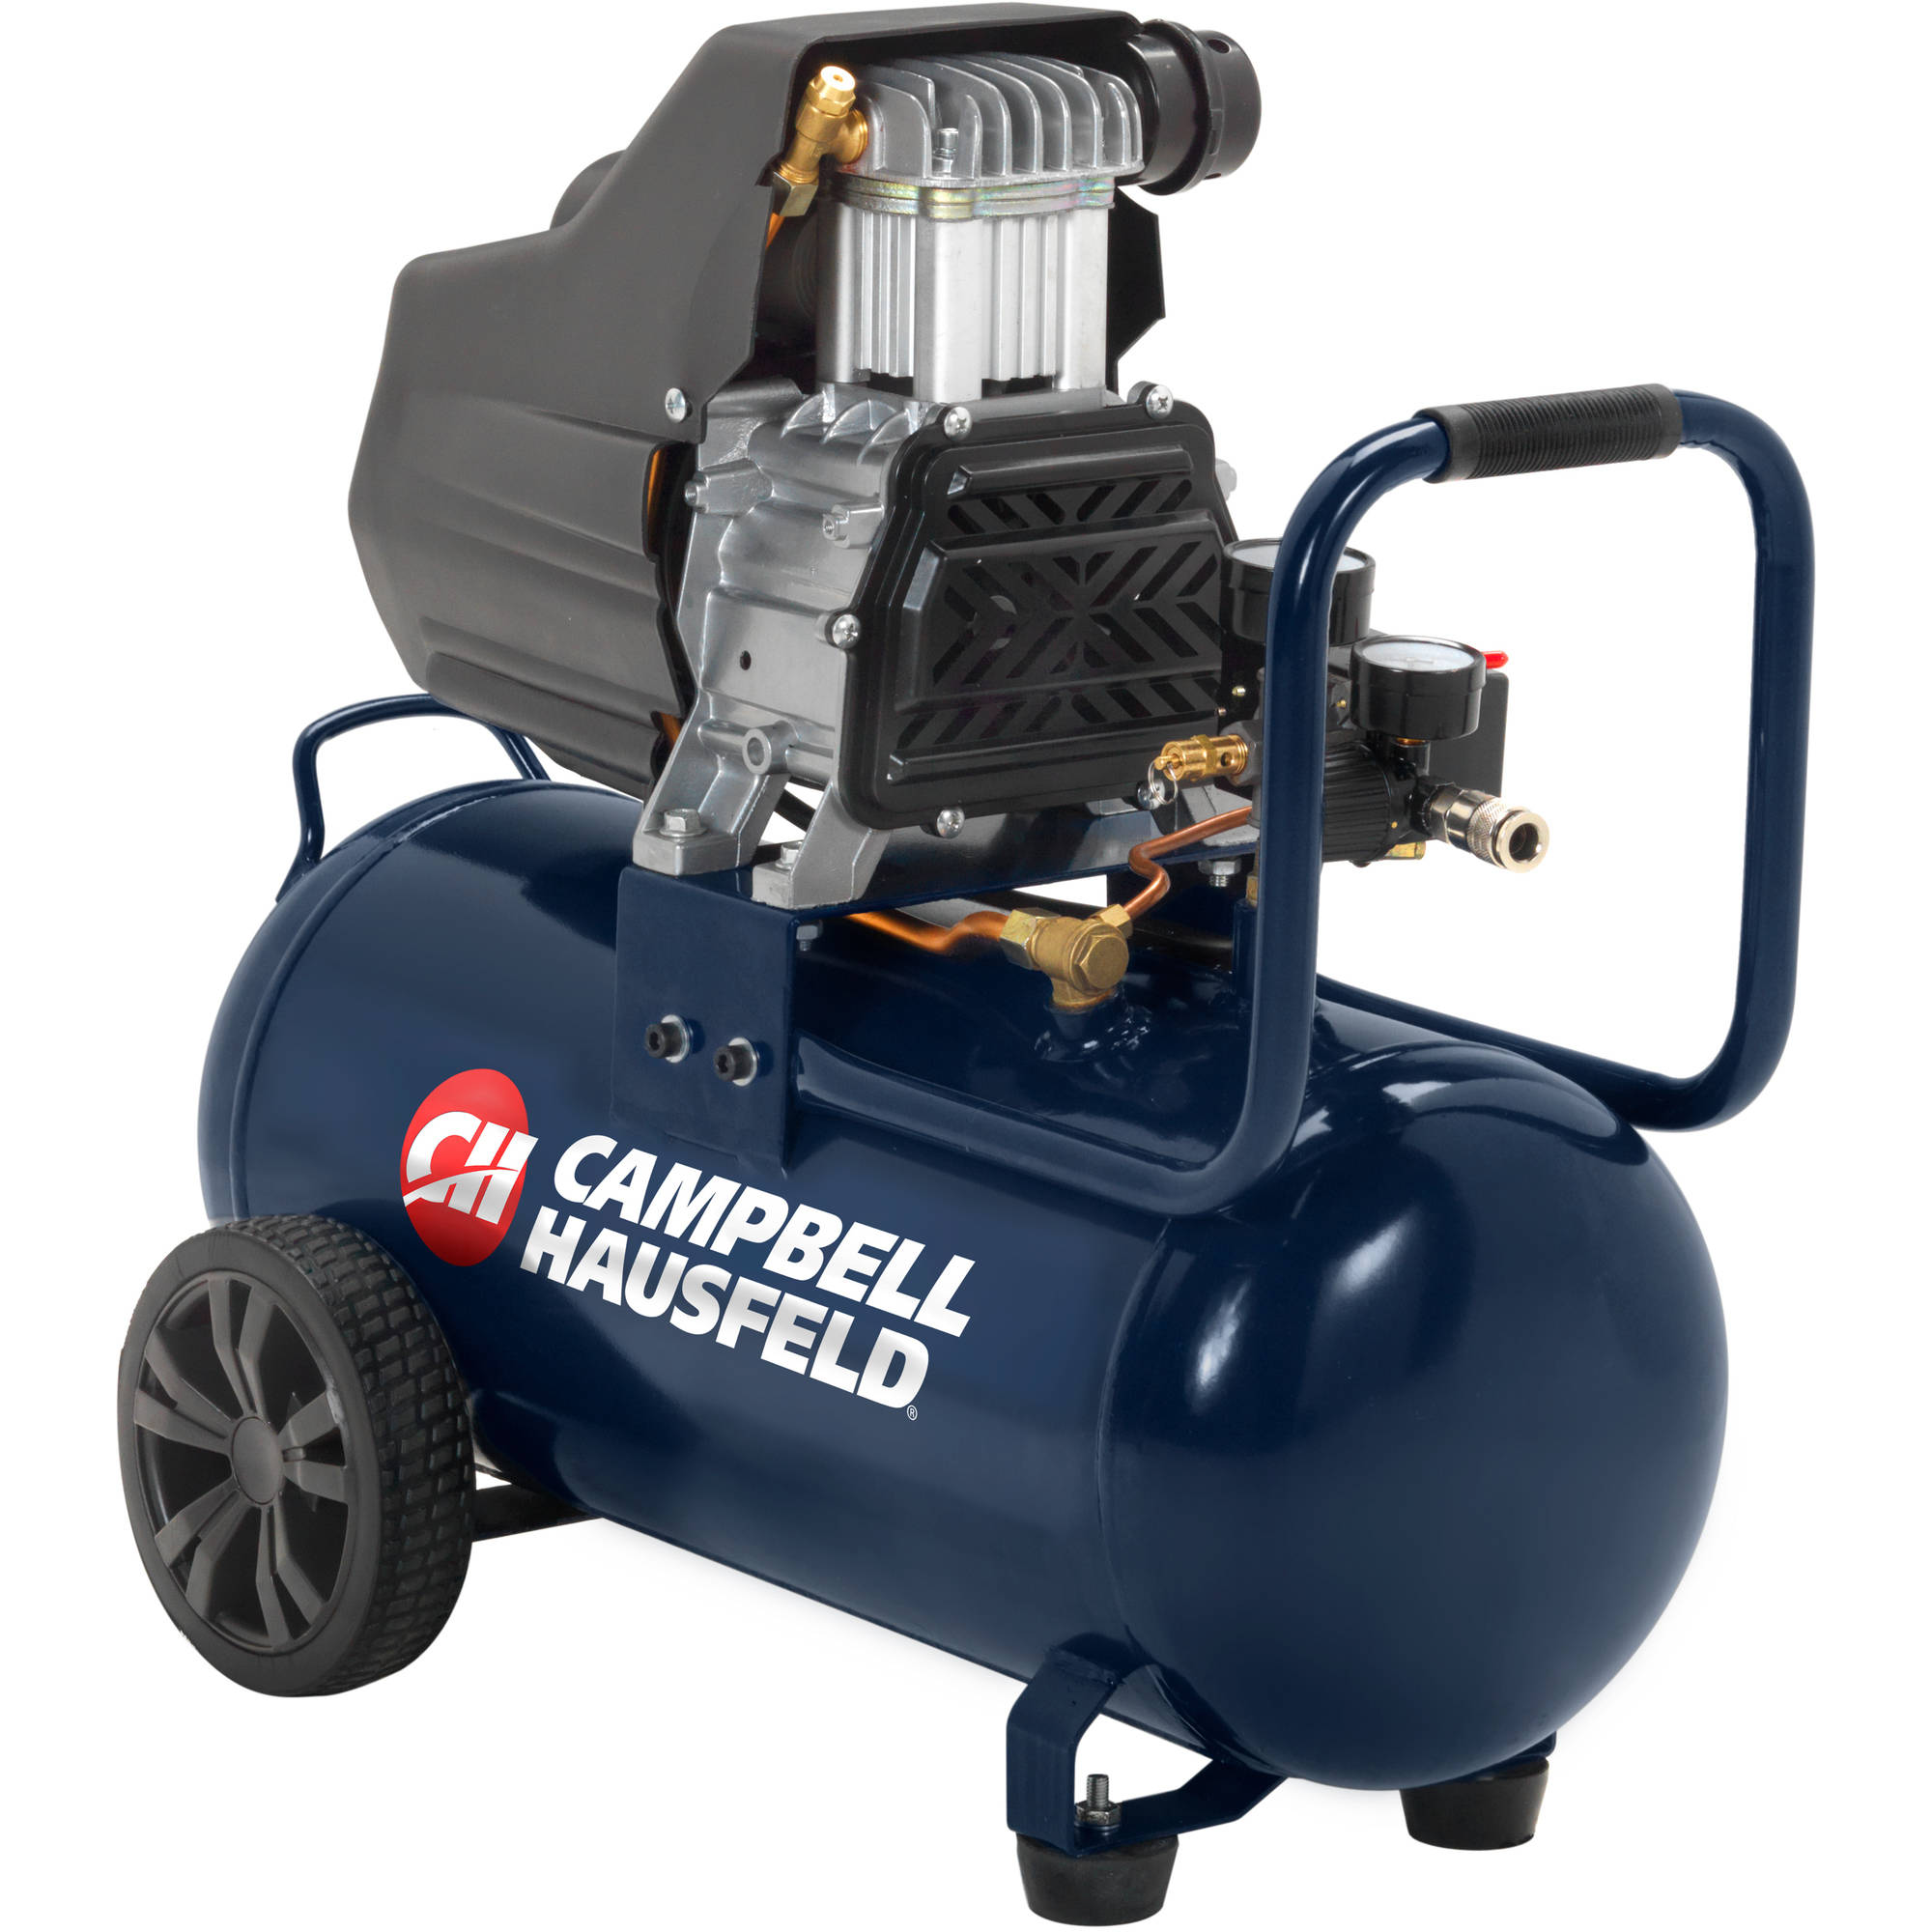 Campbell Hausfeld 8g Oil-Free Air Compressor